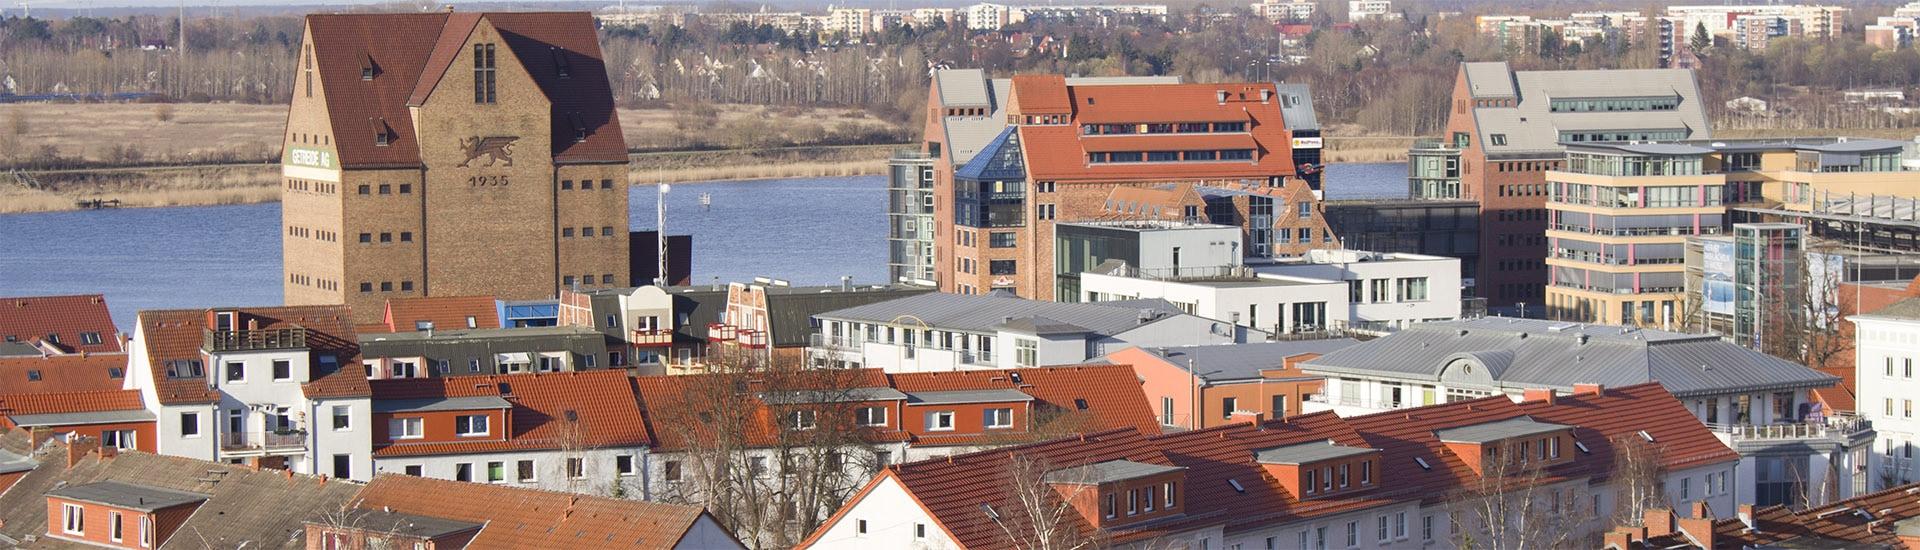 SightRunning Rostock - Entdeckertour